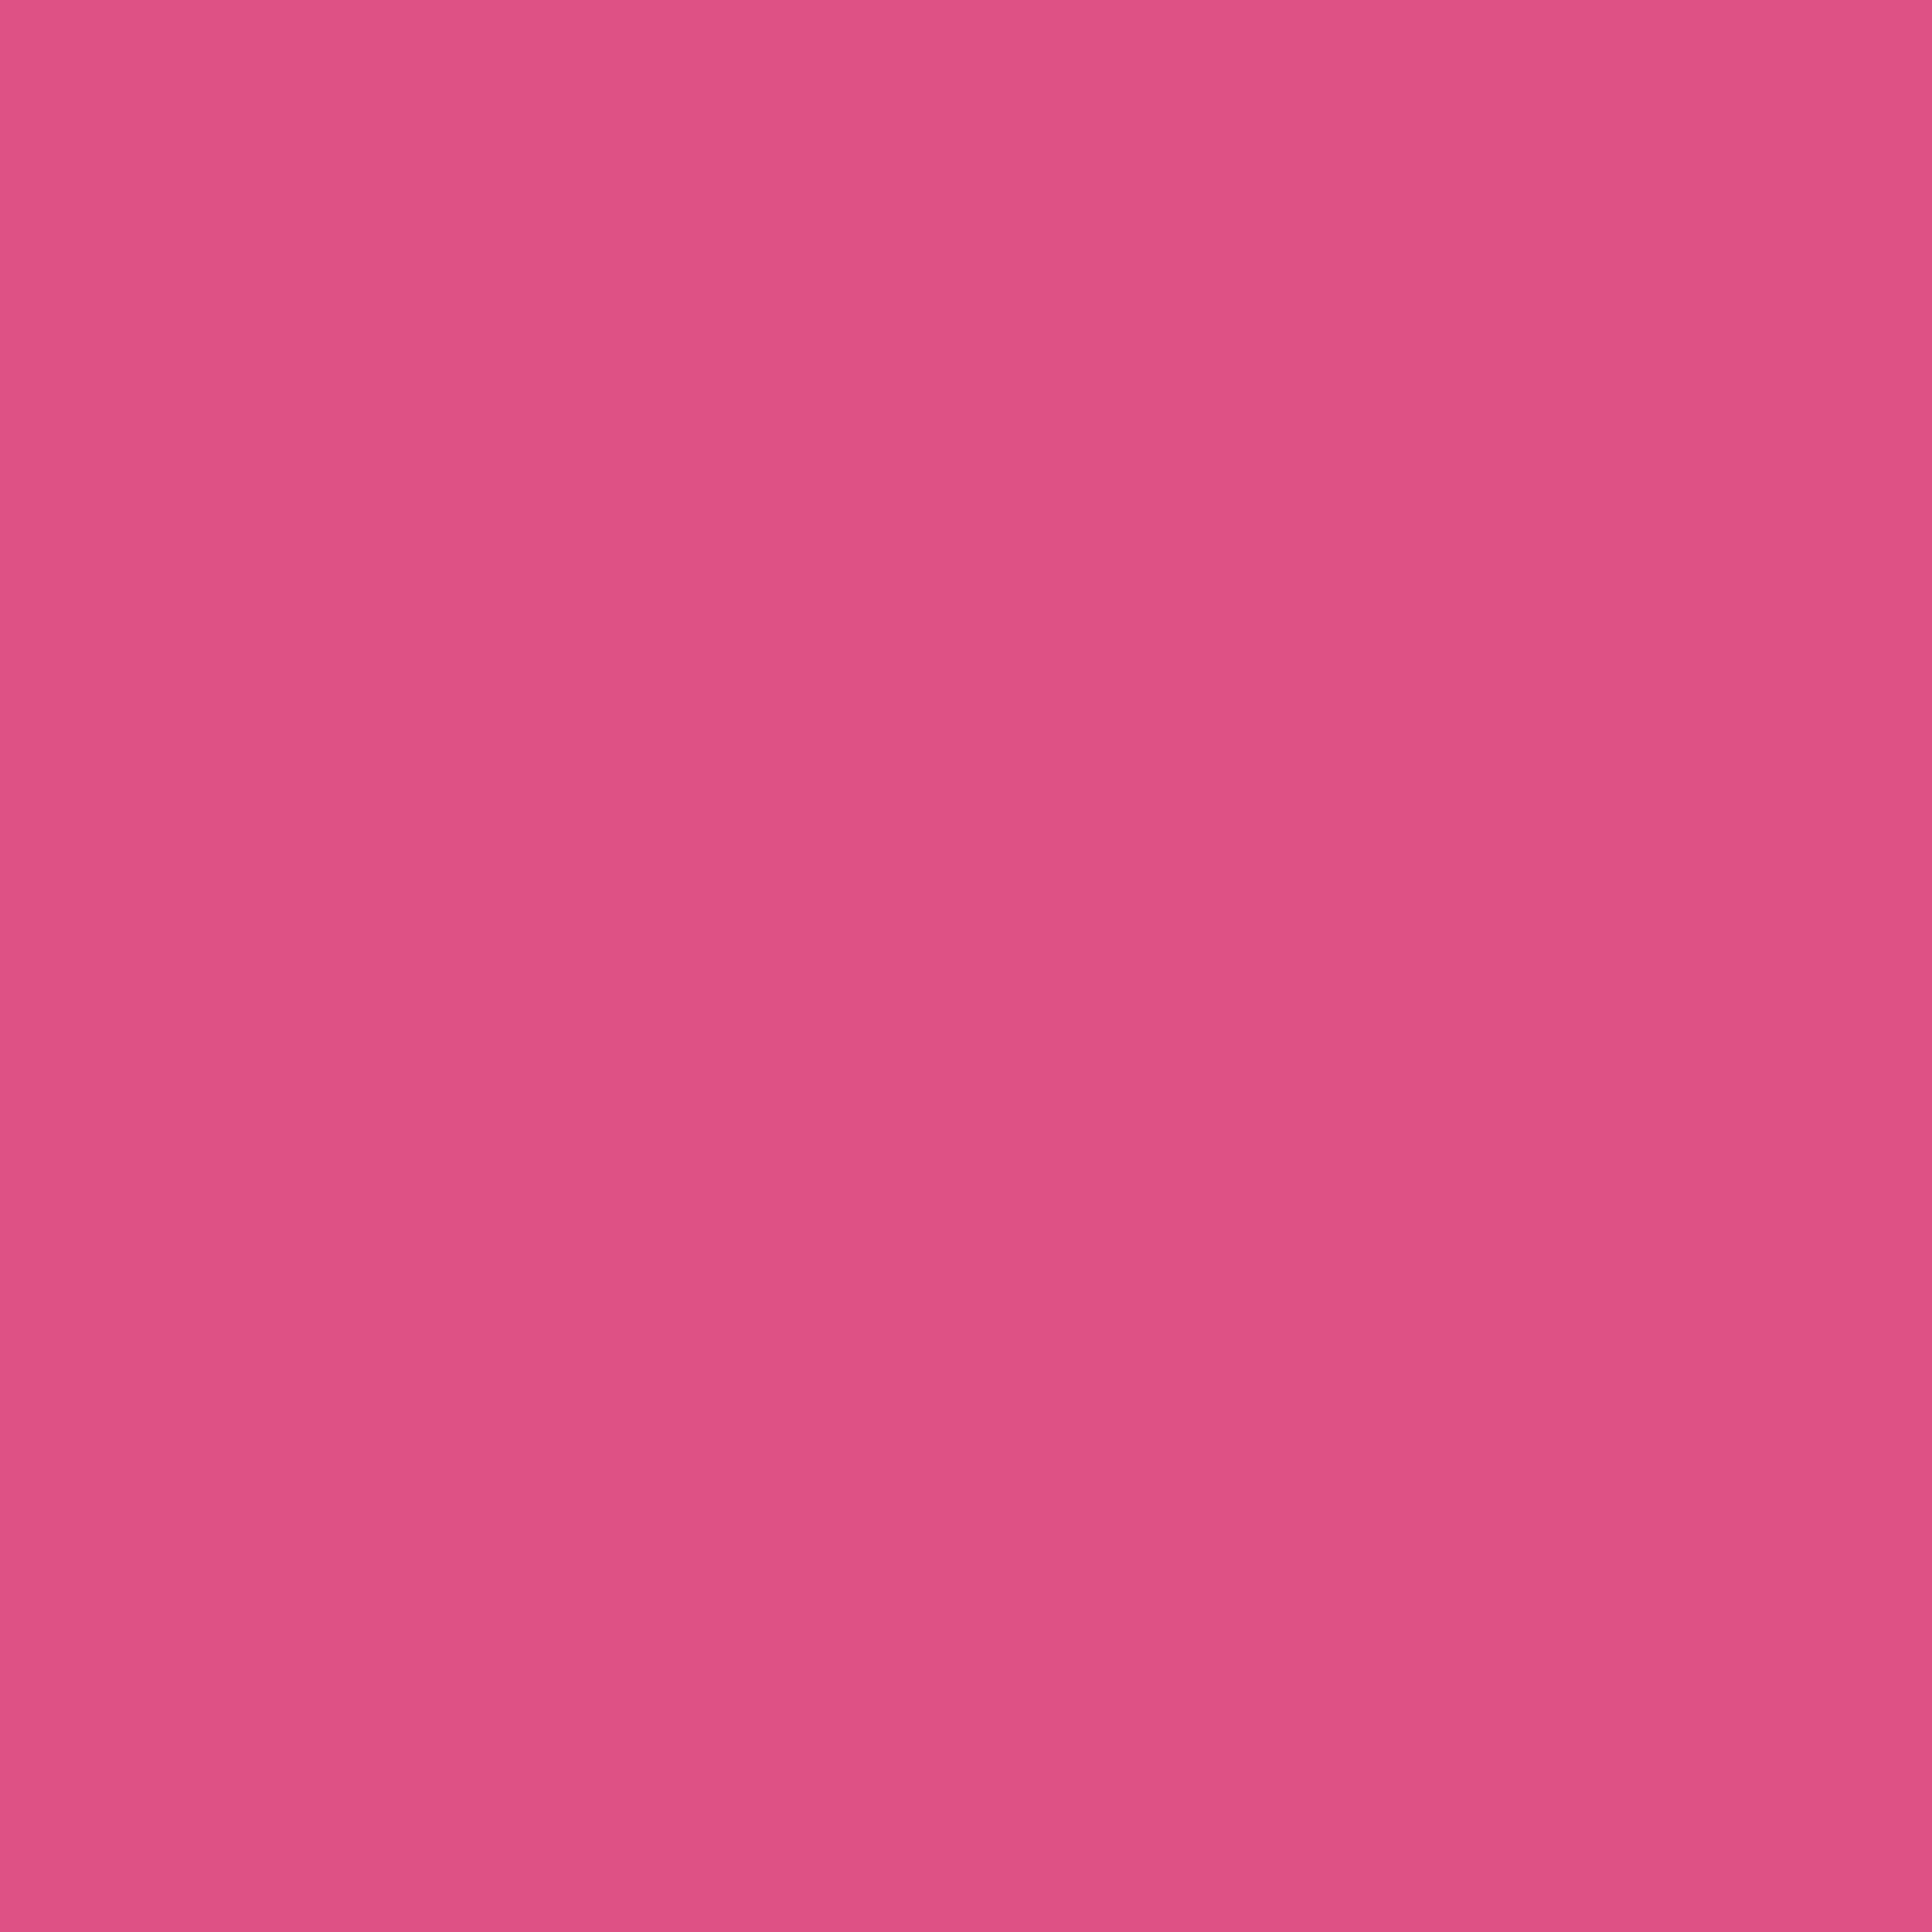 2732x2732 Fandango Pink Solid Color Background